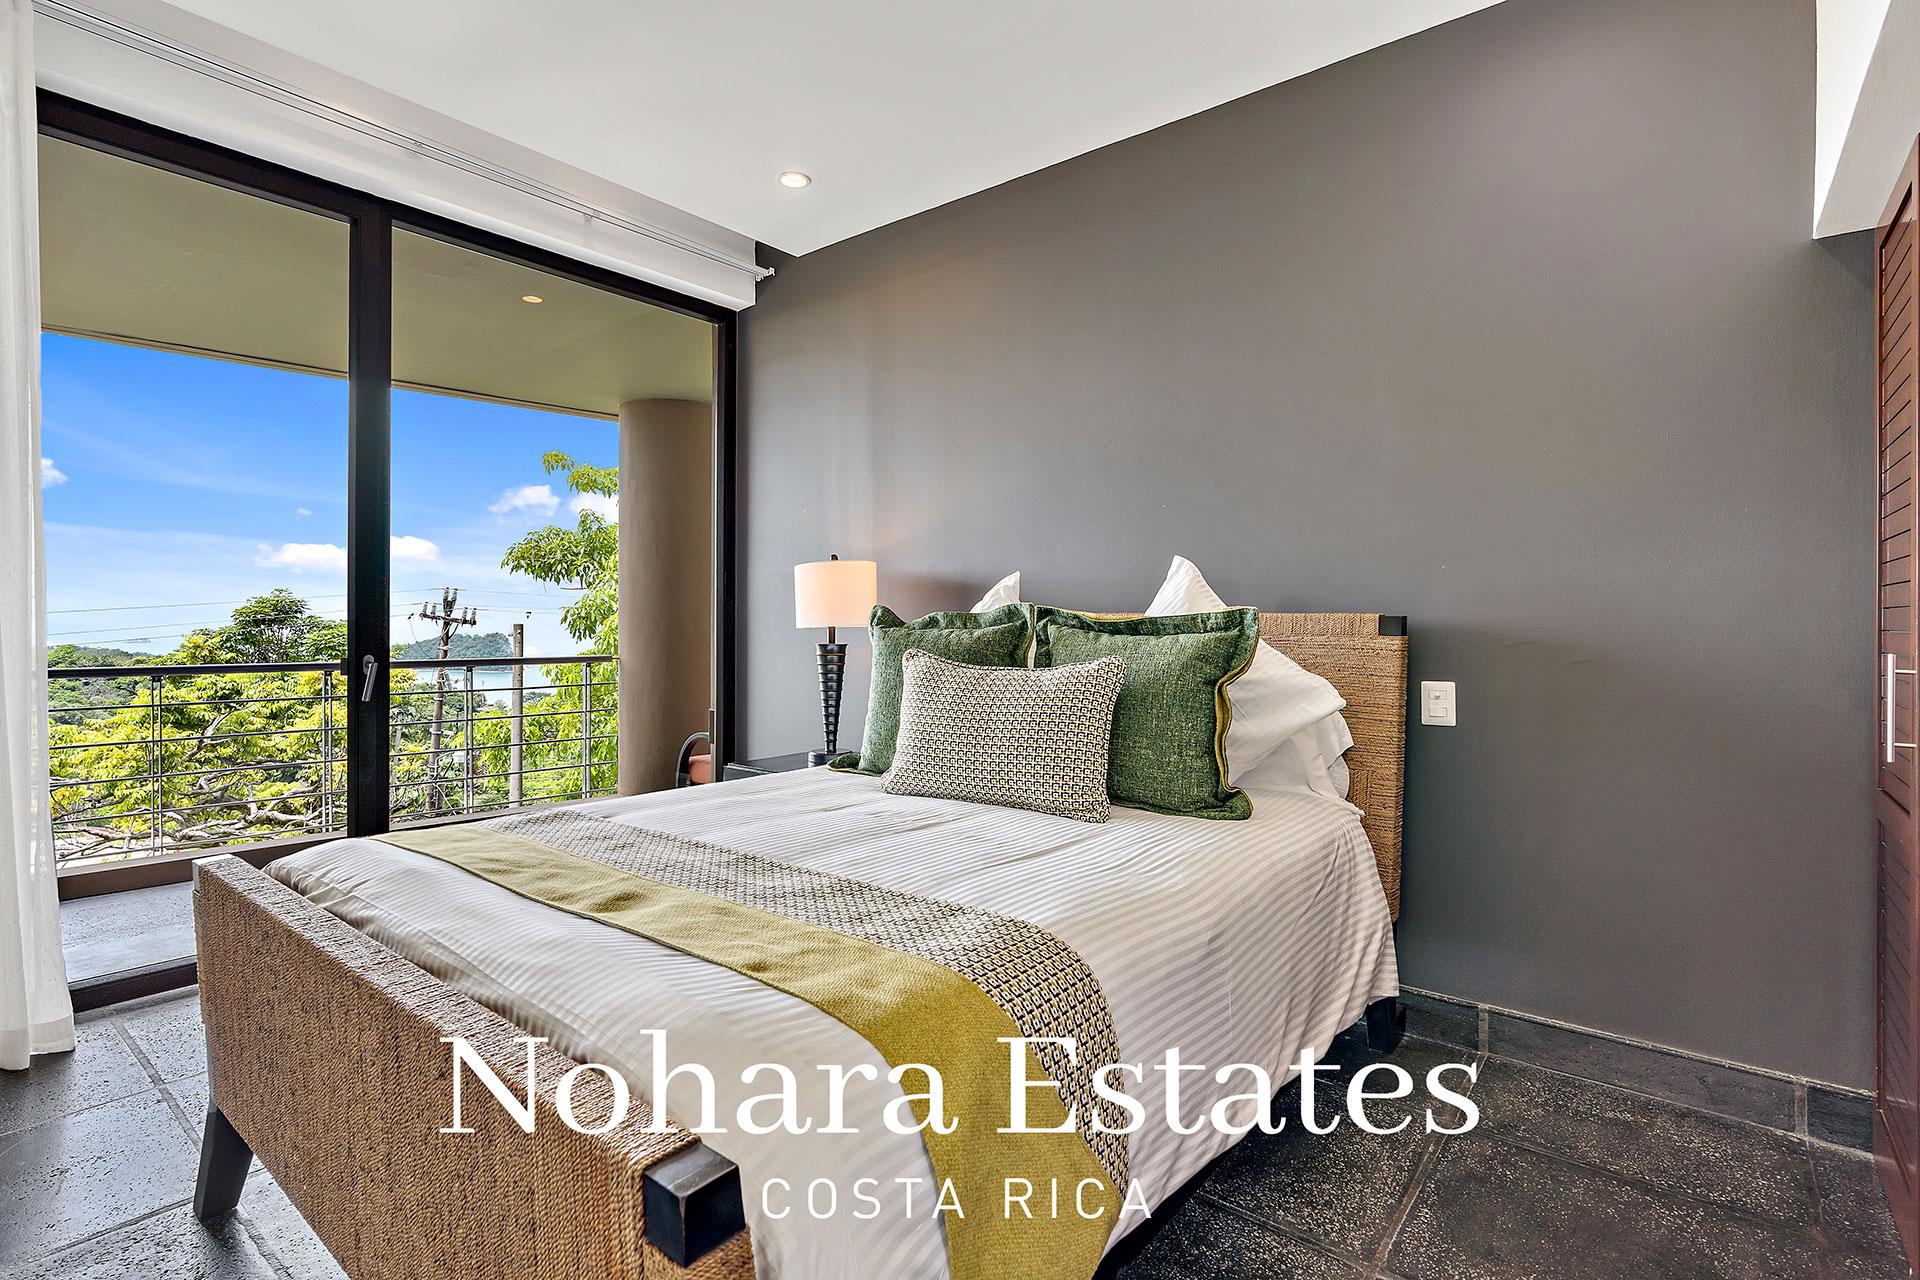 Nohara Estates Costa Rica 122 Apartment Quepos Los Altos 1